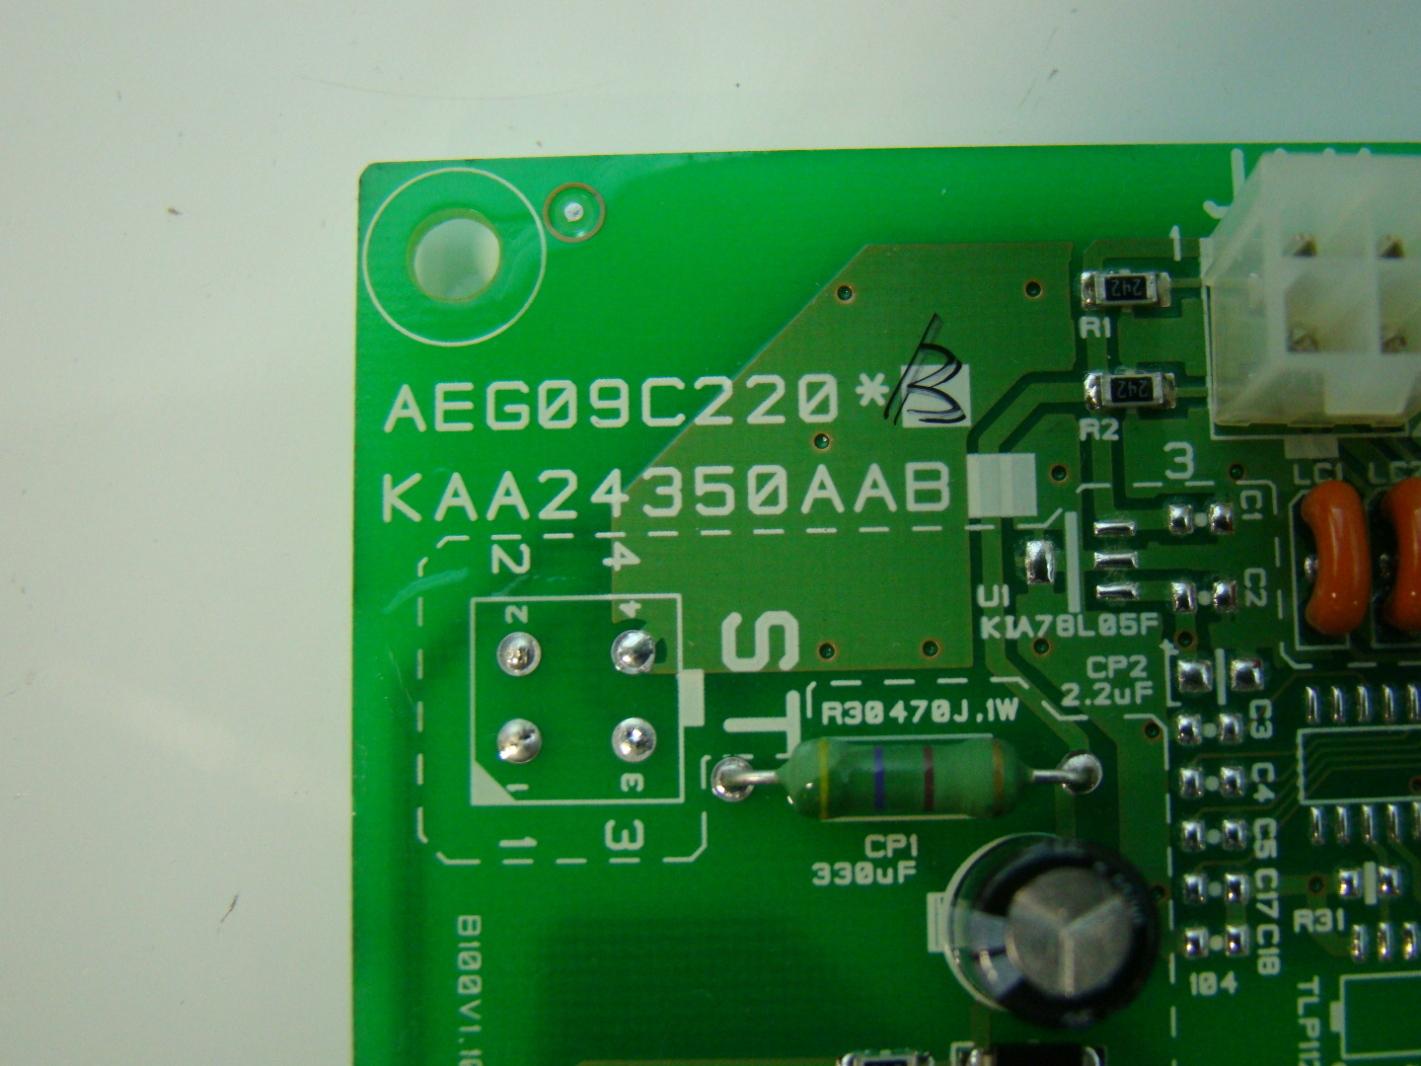 Details about LG Otis Elevator PC Board DCD 23 AEG09C220 #662704